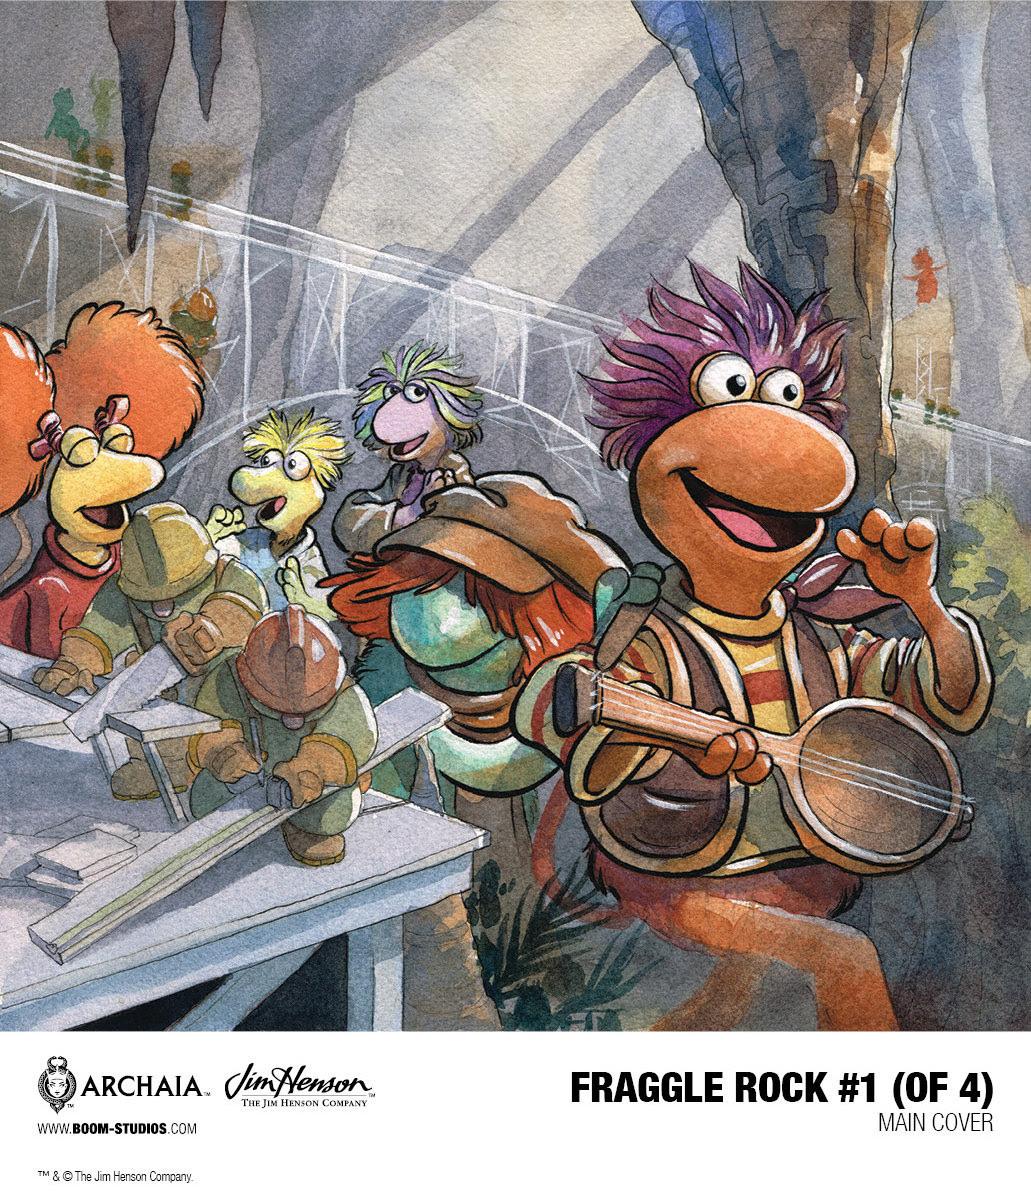 BOOM! Studios Fraggle Rock #1 Main Cover by Jared Cullum